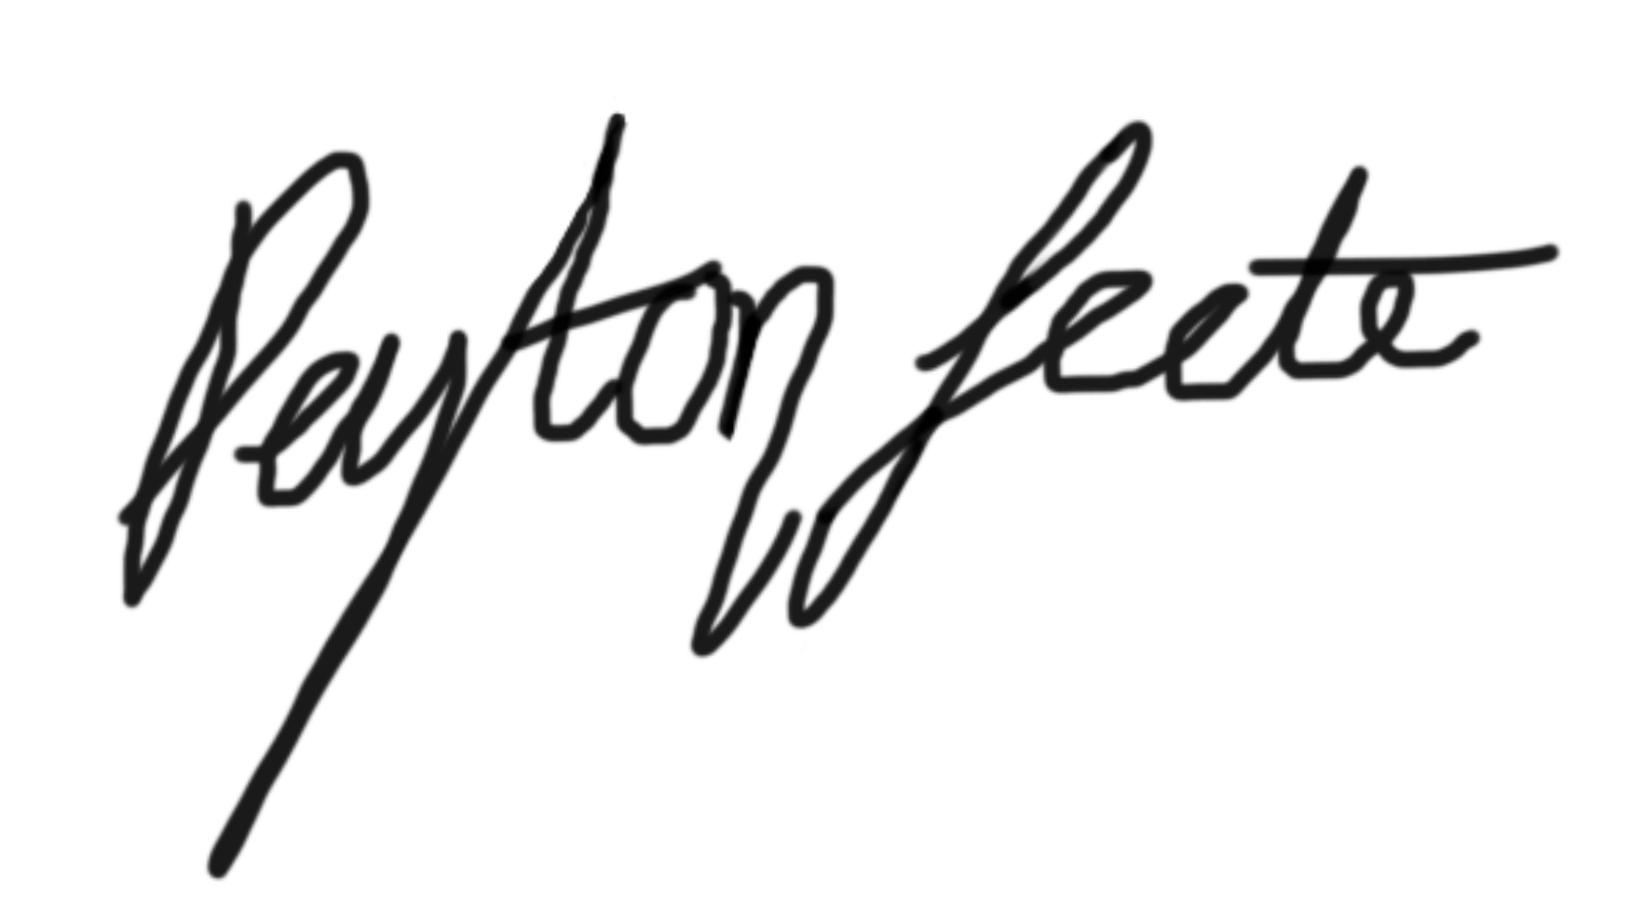 Peyton Leete's Signature